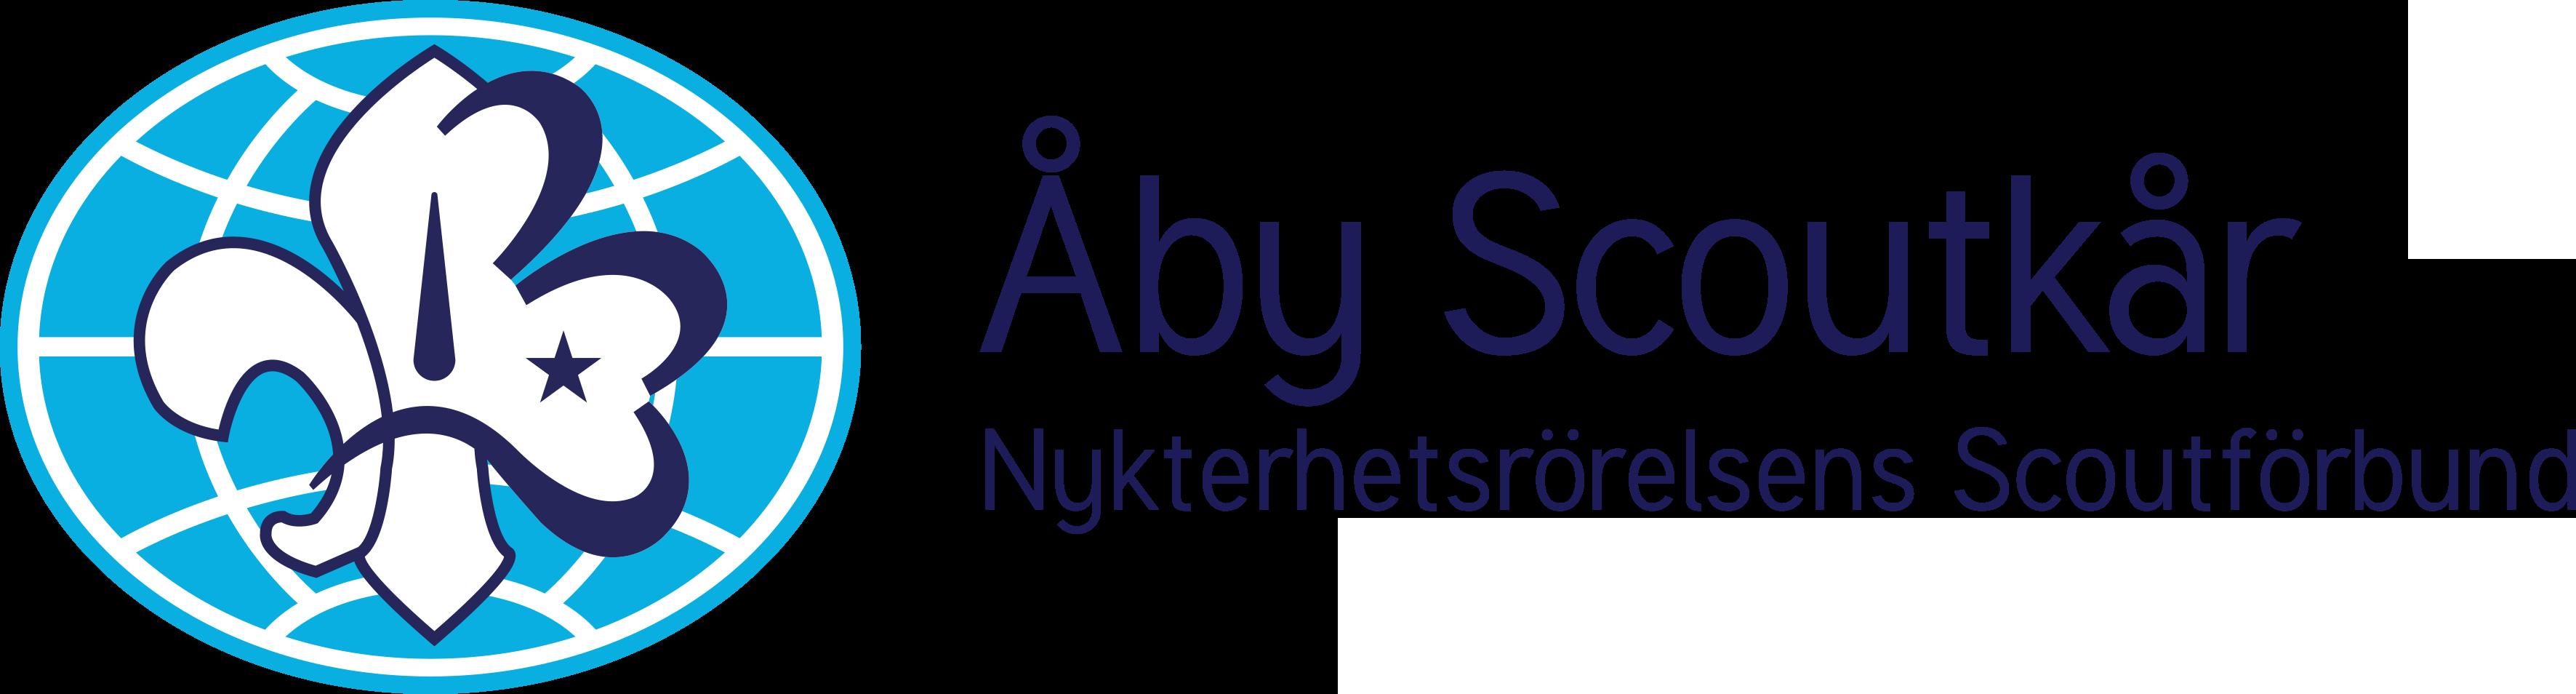 Åby Scoutkår